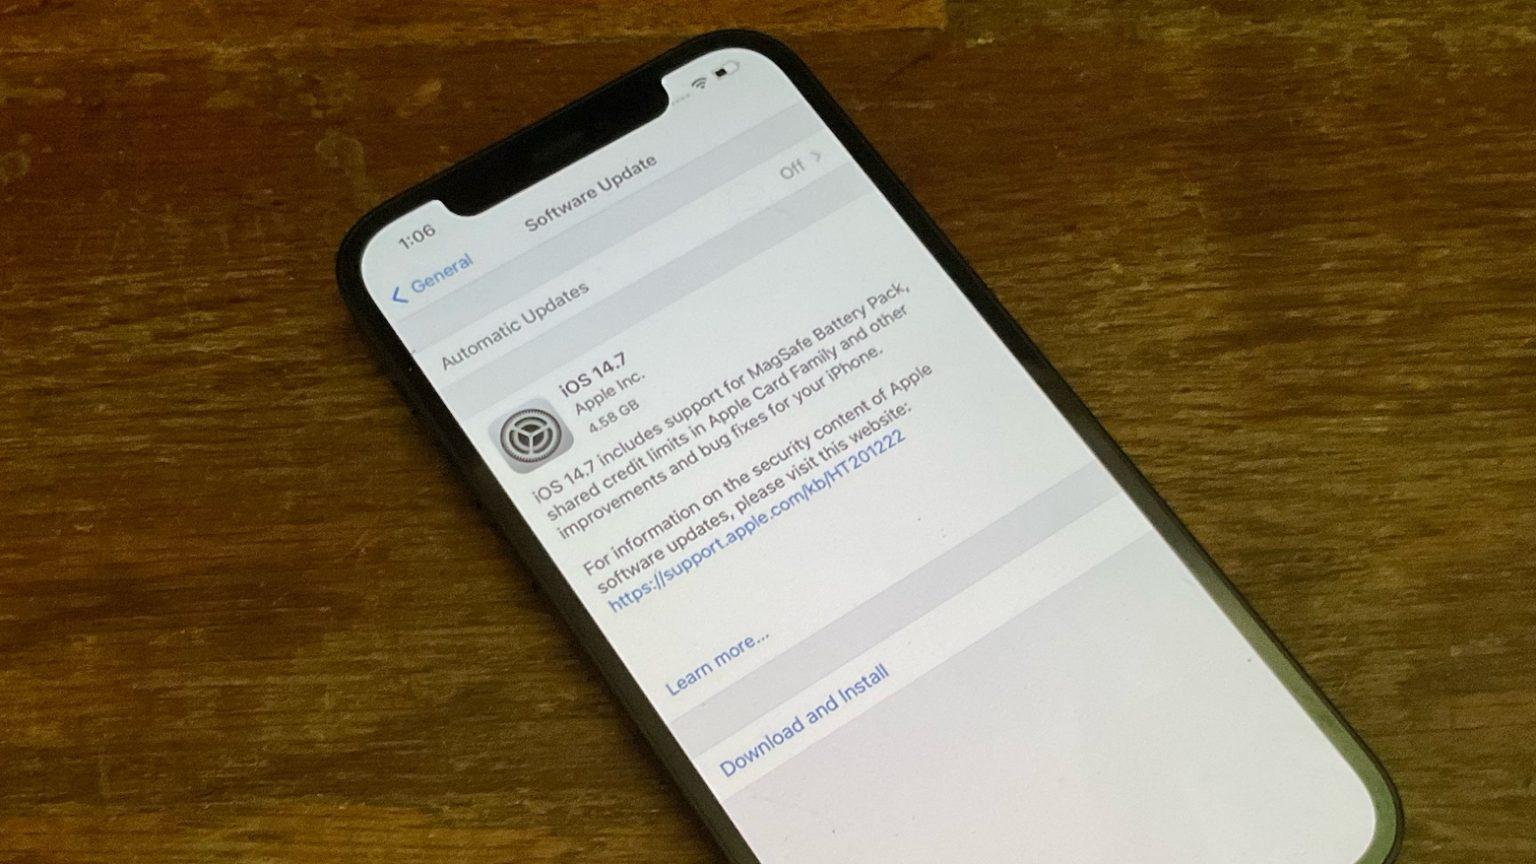 iOS 14.7 will bring Apple Card tweaks, Apple battery pack support